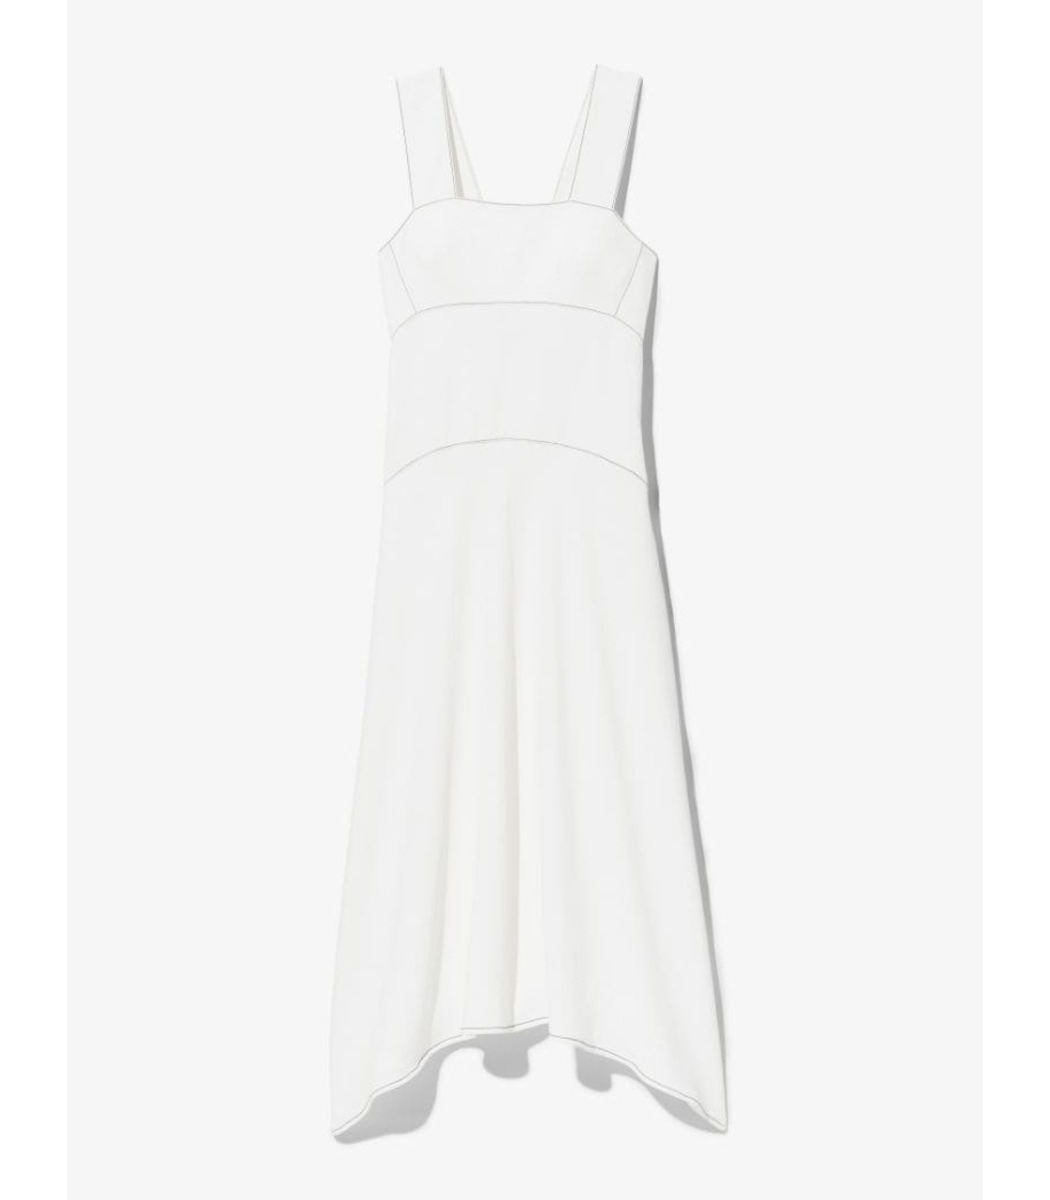 Proenza Schouler White Label Clothing Rumpled Pique Dress